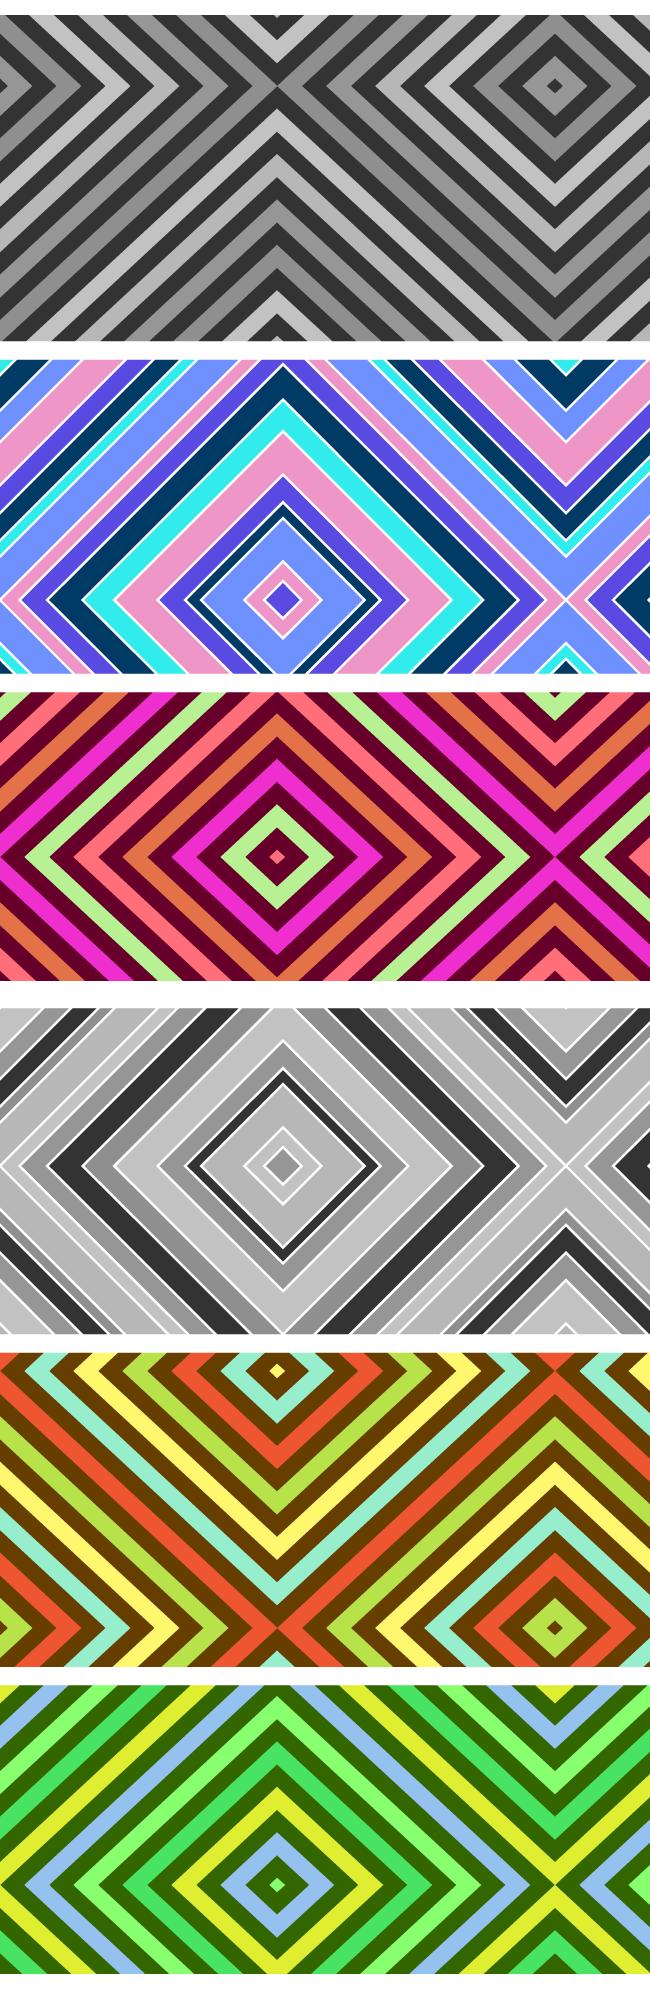 stripes pattern Premium: Diamond stripes seamless vector pattern